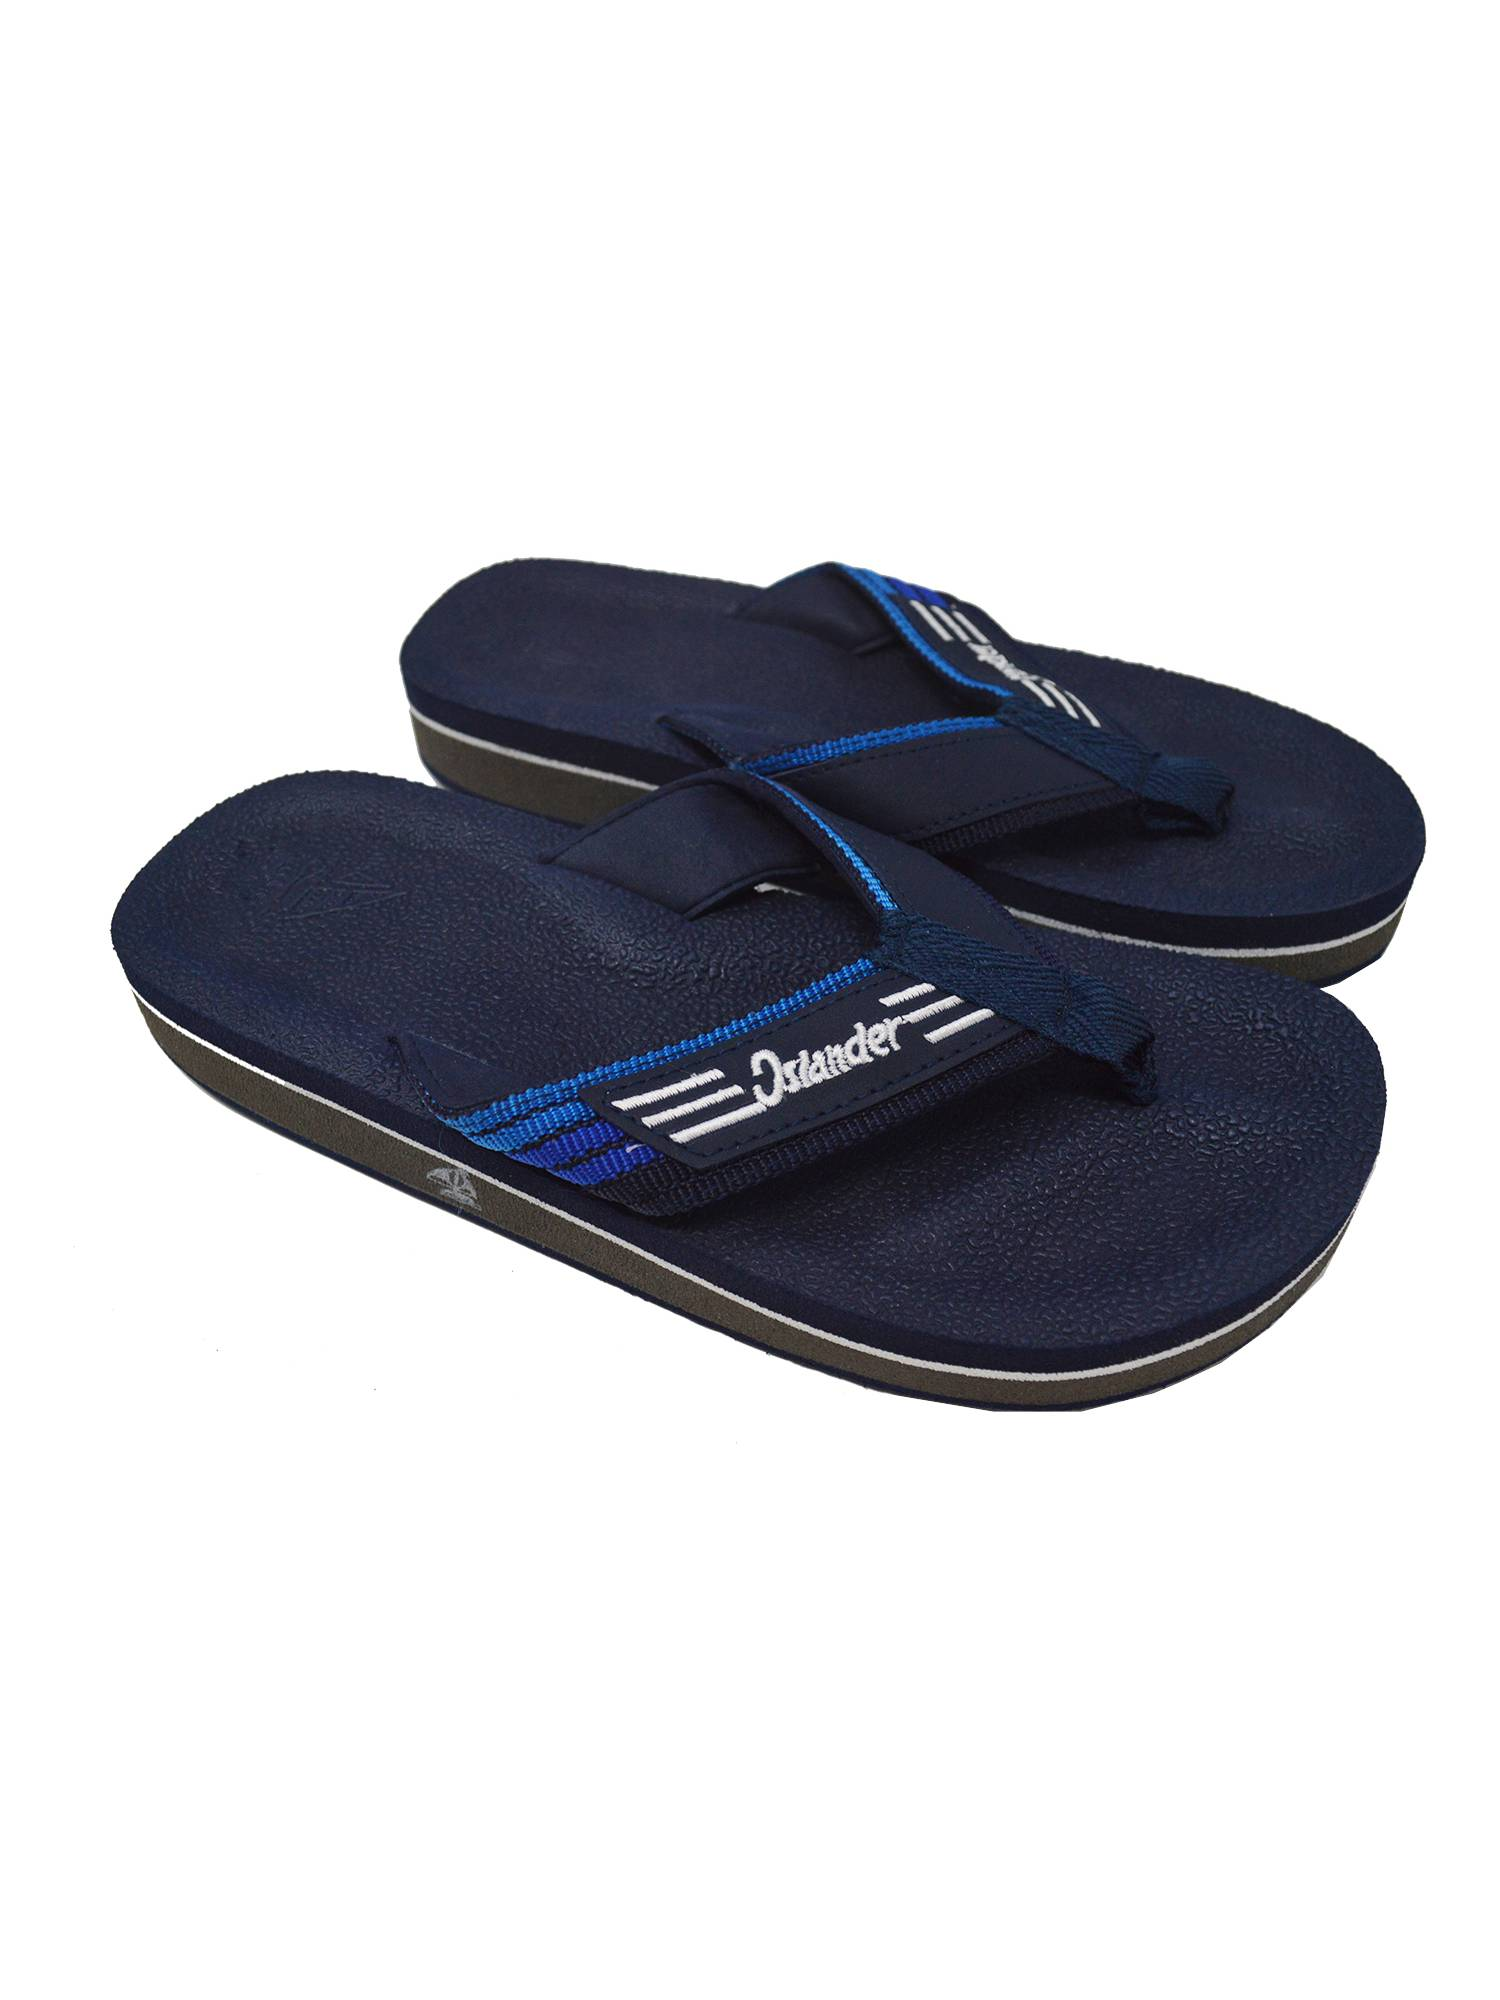 598b682accf3 Islander - Islander Unisex All-Weather Comfortable and Stylish Flip-Flop  Sandals - Walmart.com